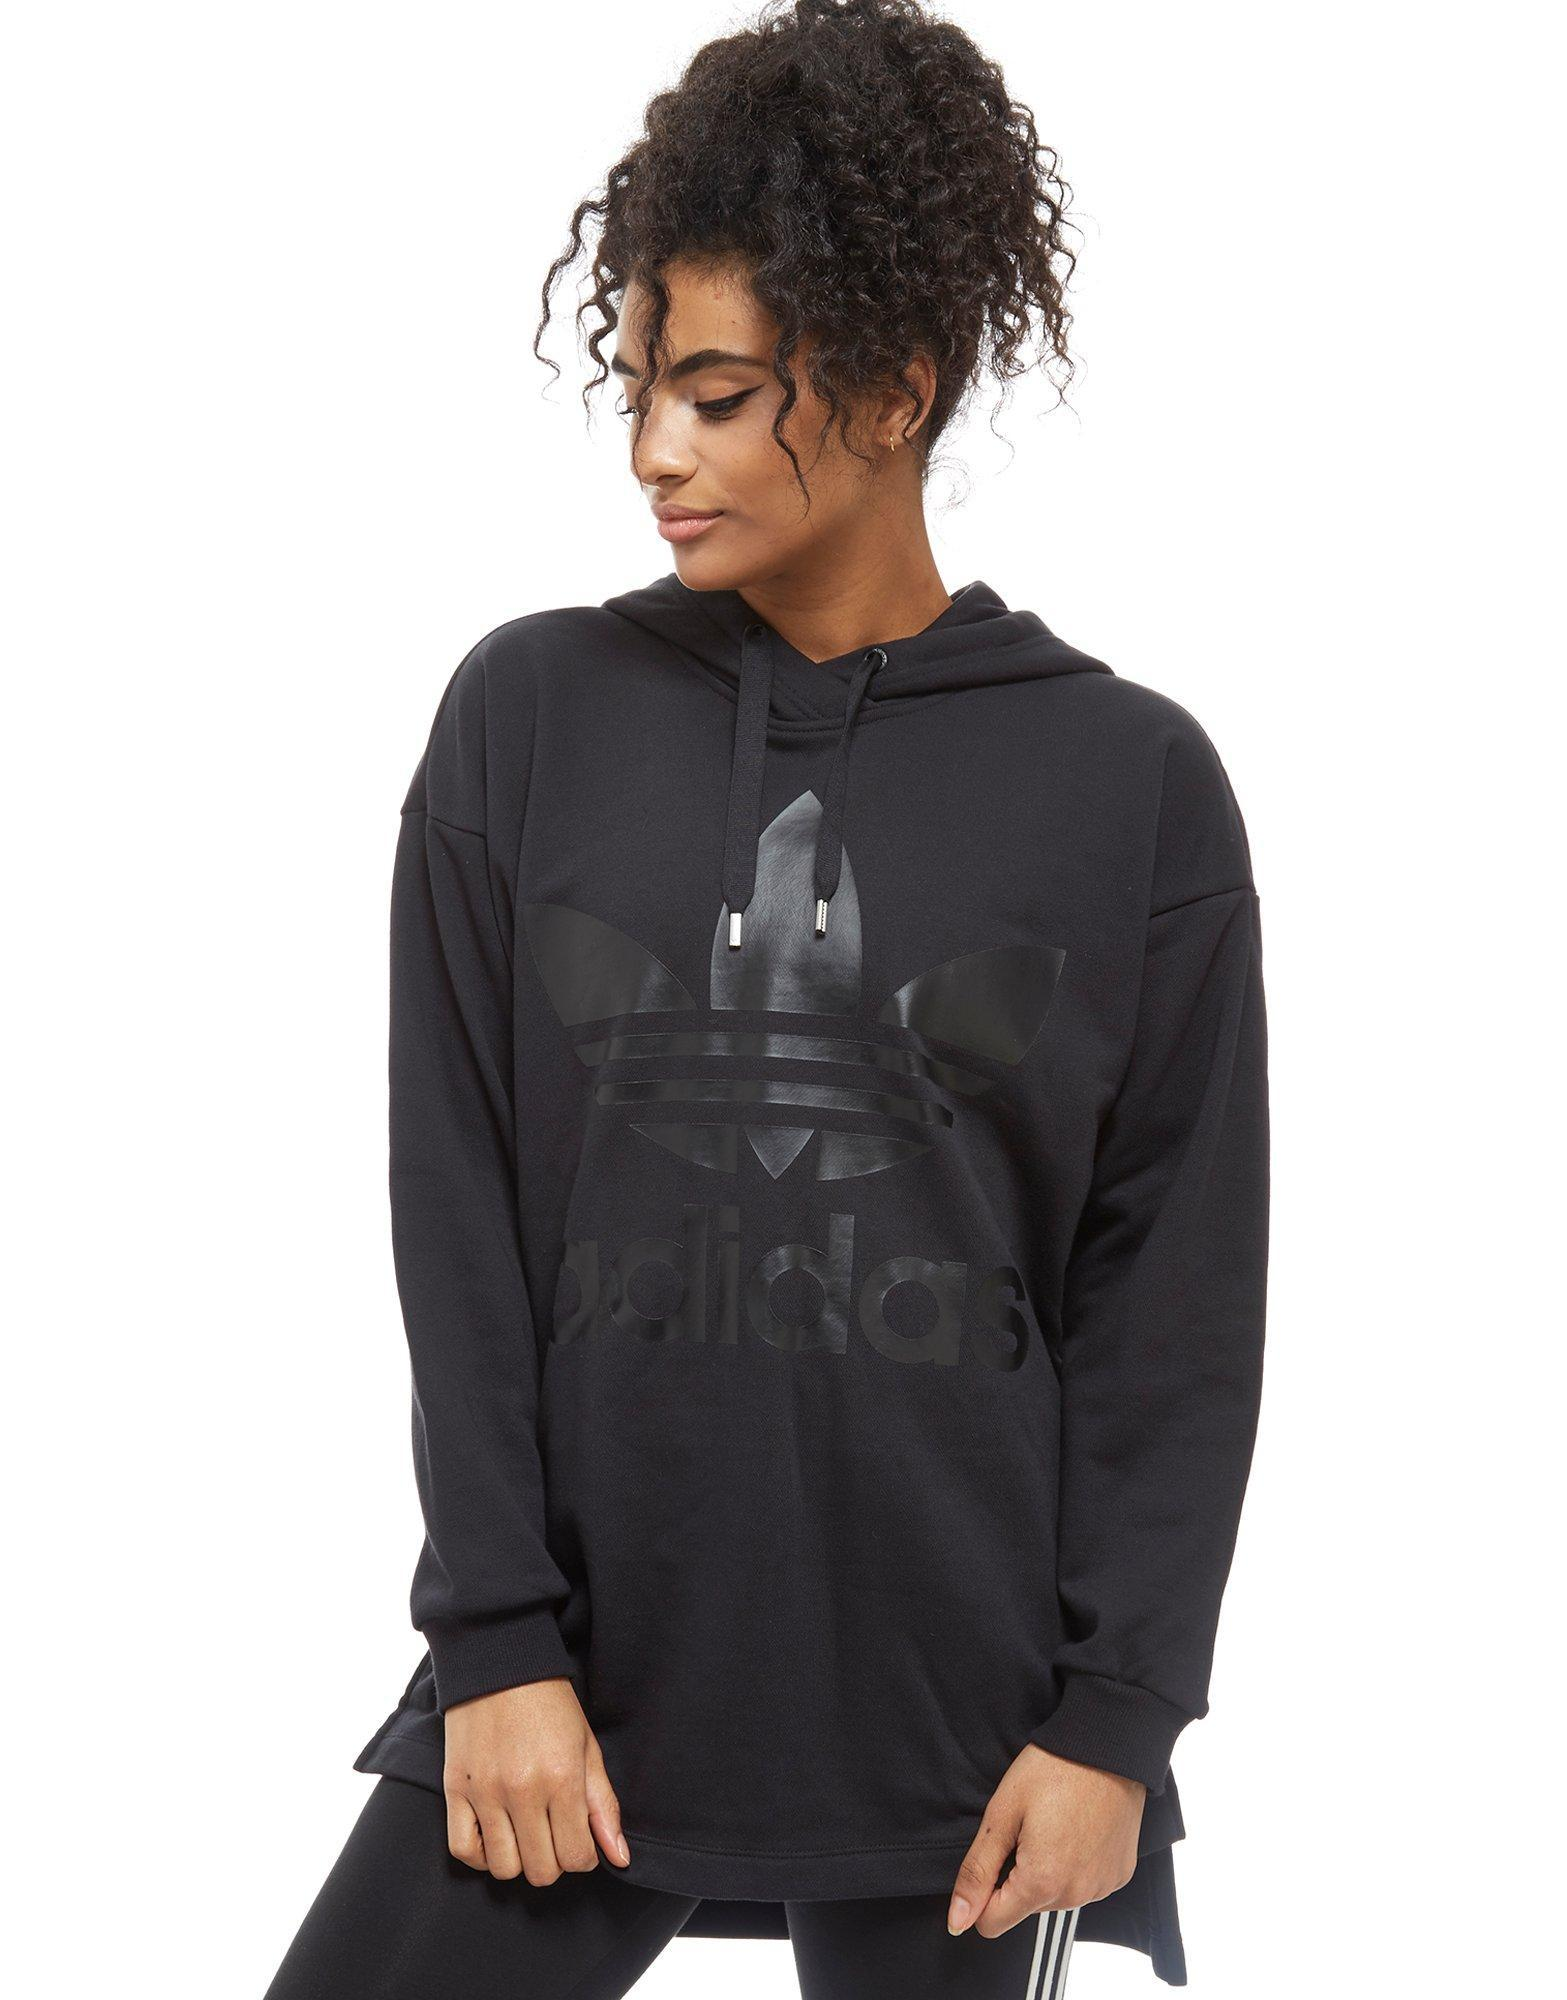 adidas Originals Trefoil Hoodie Dress in Black Lyst